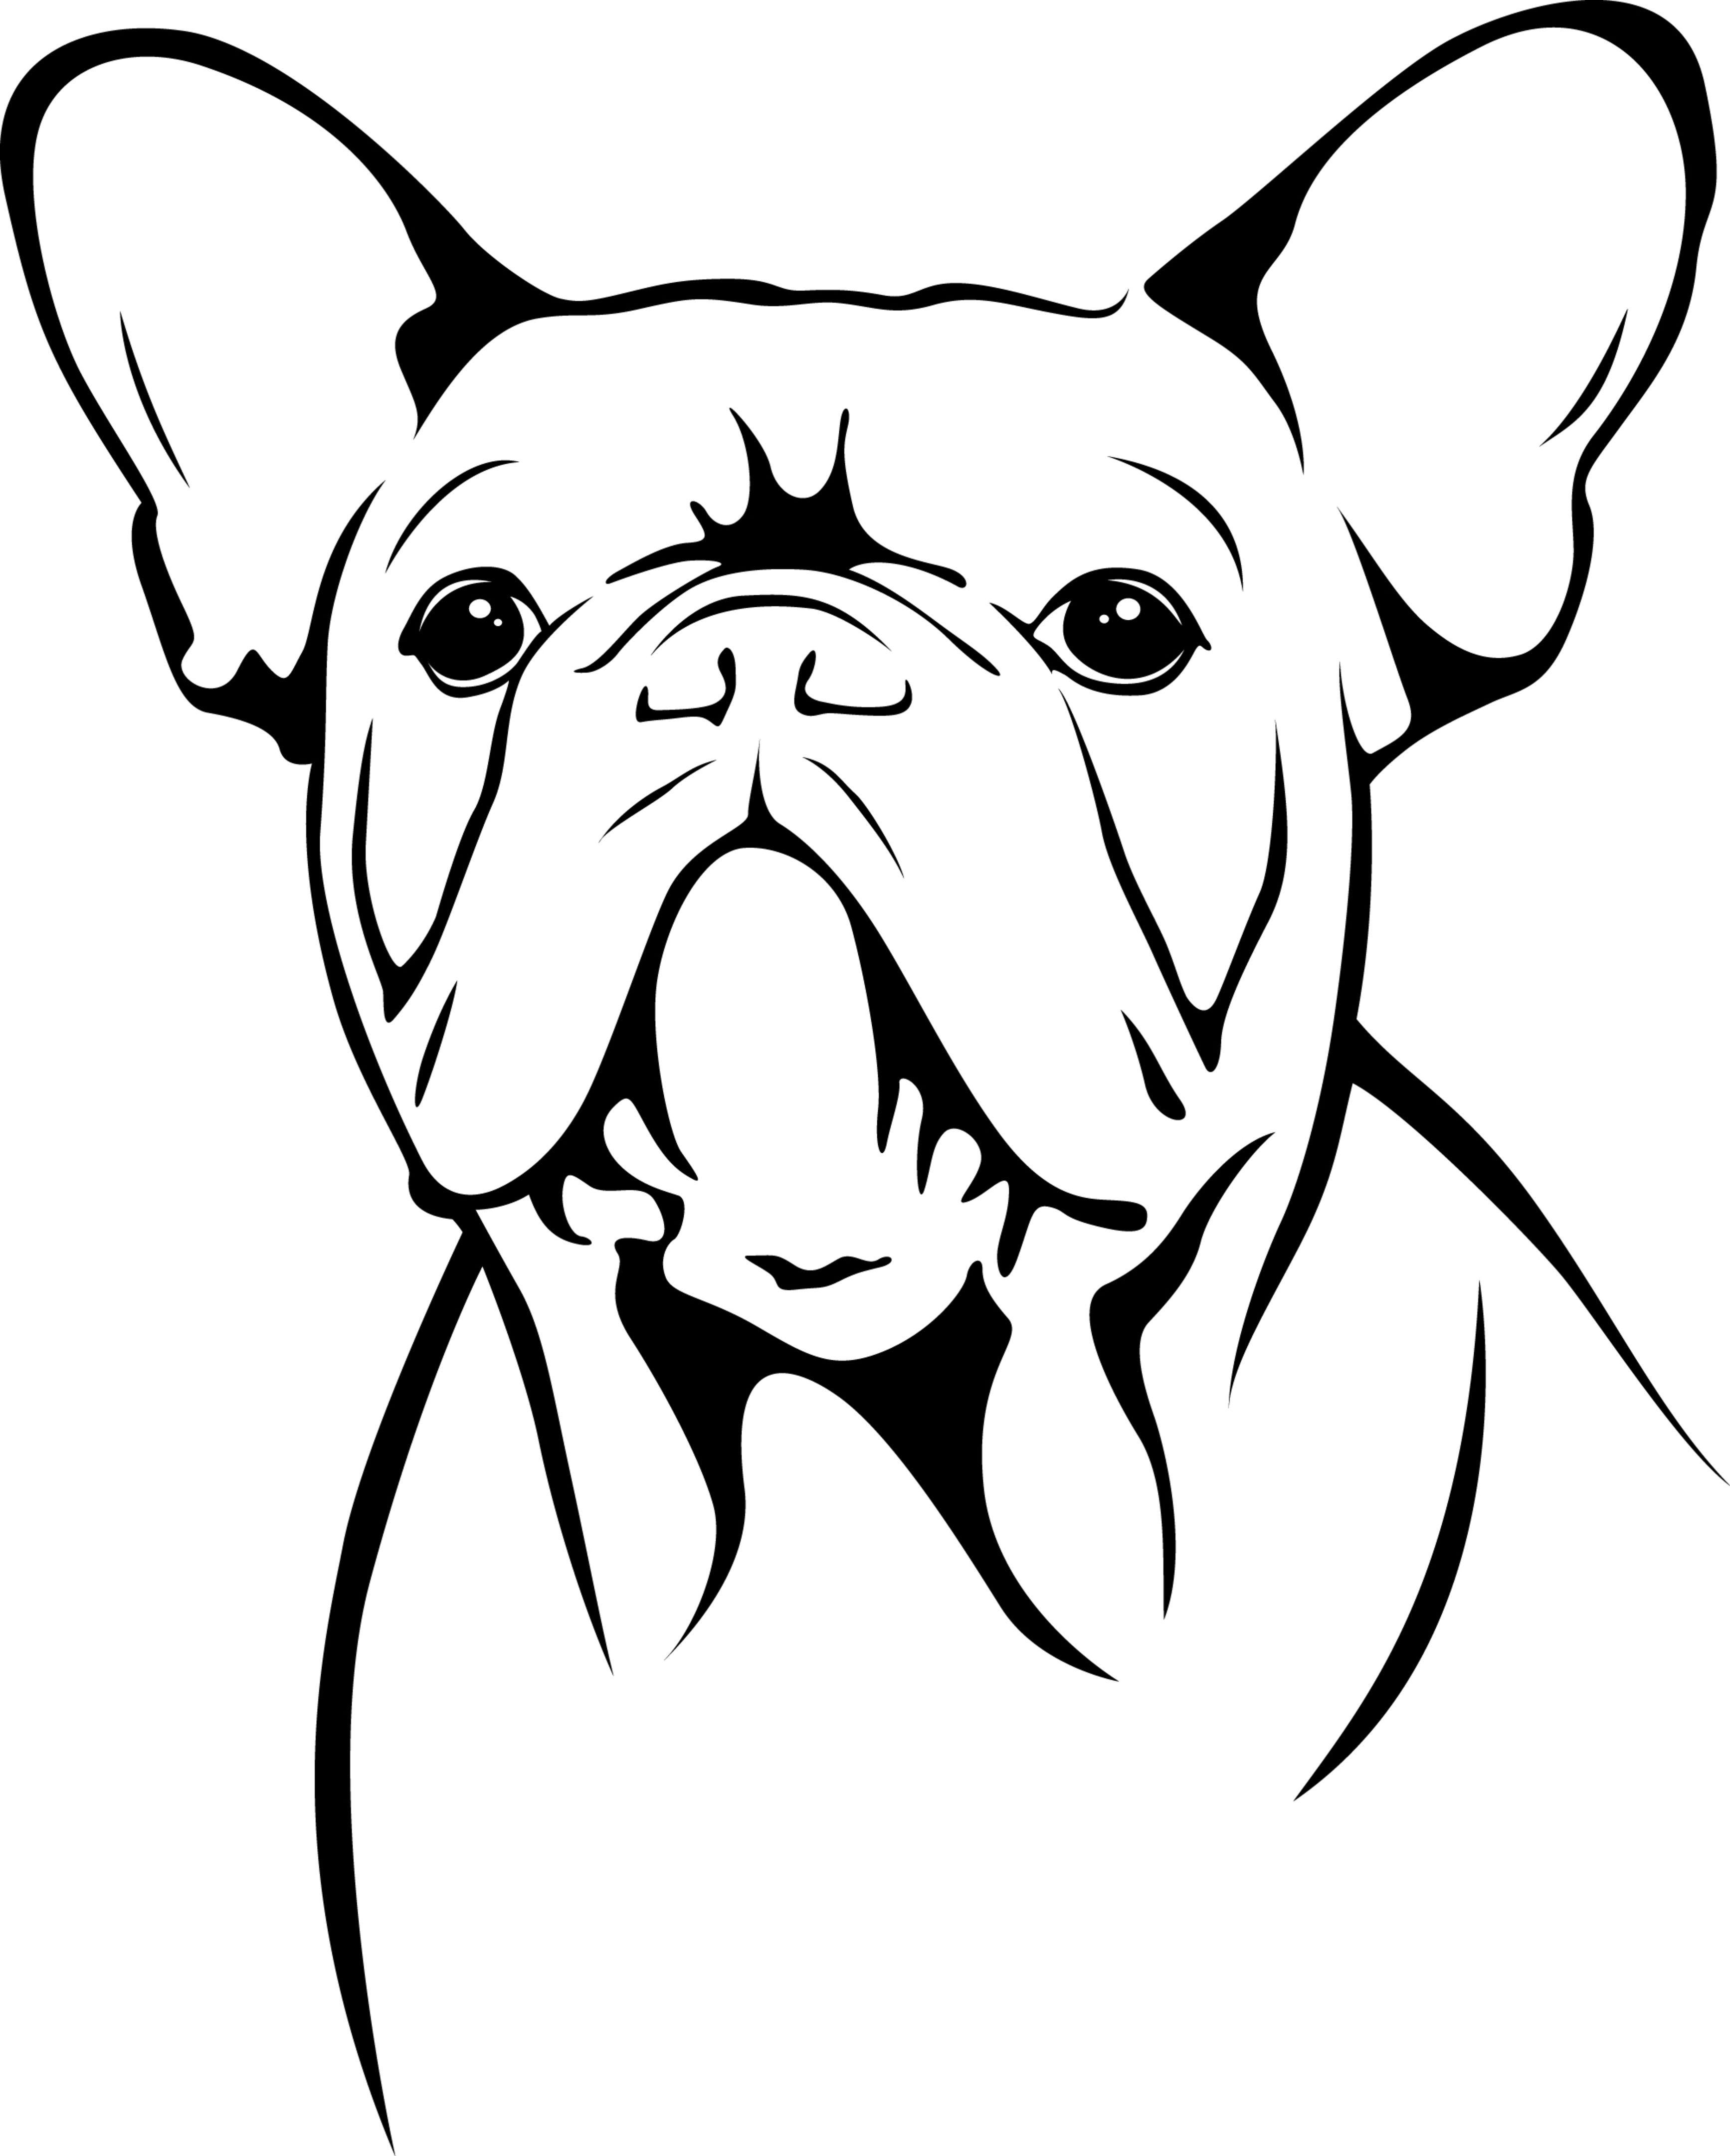 7 Pics of French Bulldog Coloring Pages - French Bulldog ...